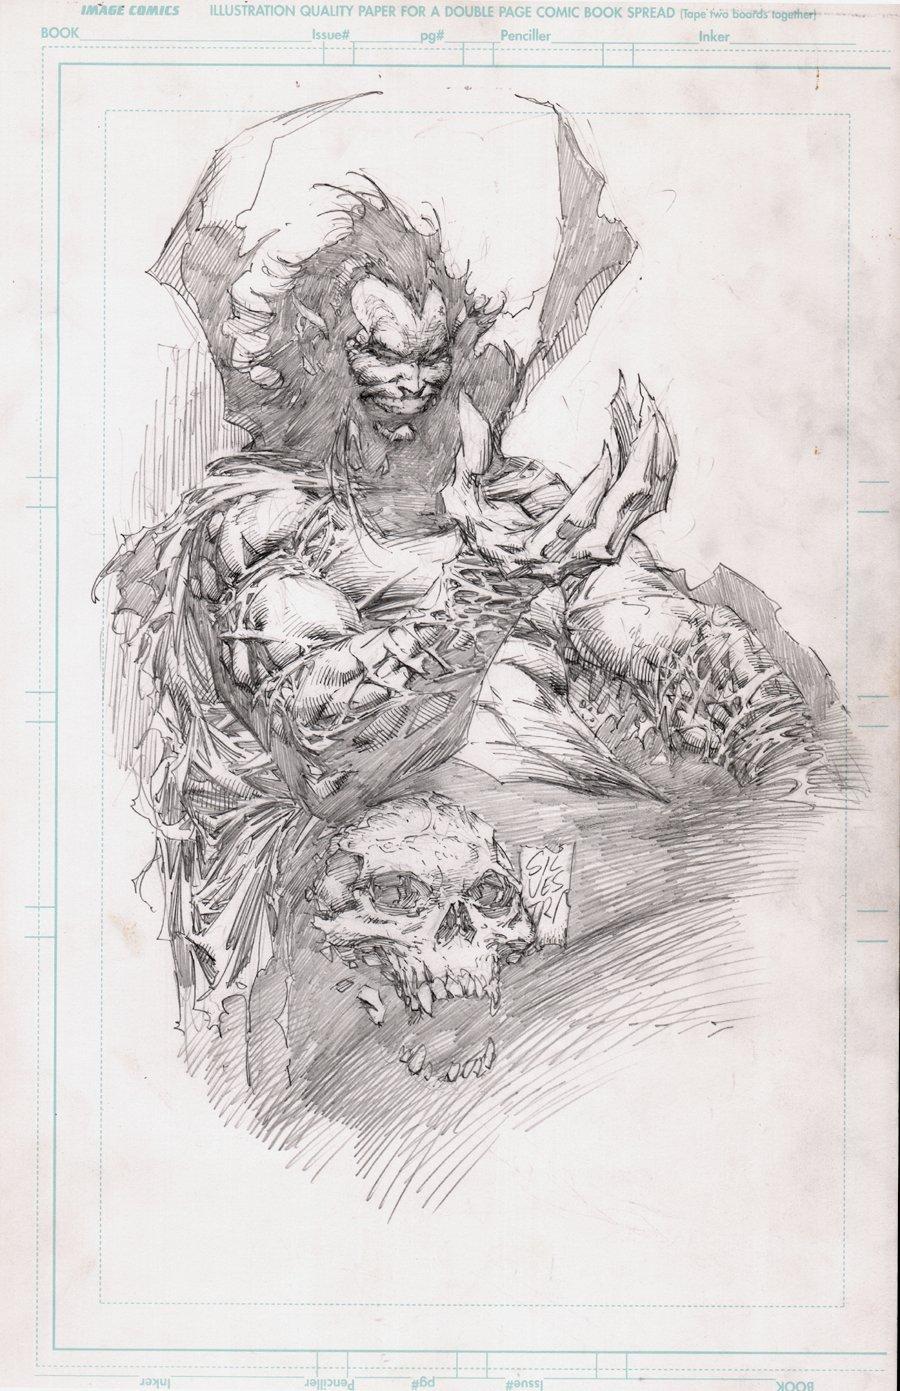 The Darkness #1 (Mephisto: Devil's Reign) Back Cover Art